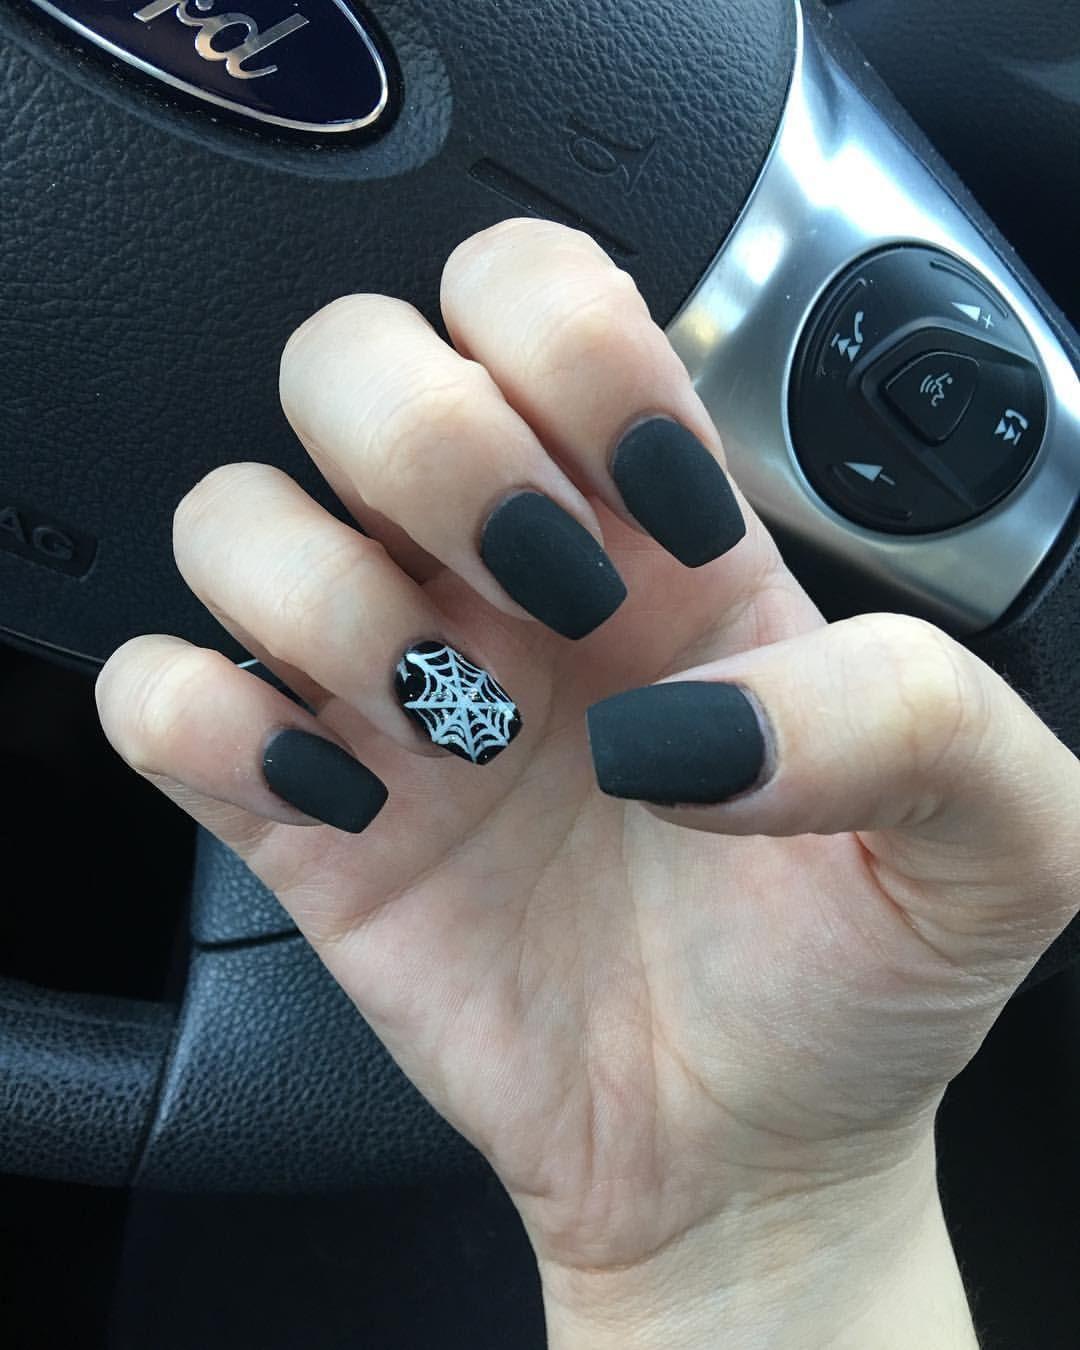 33 Breathtaking Designs For Almond Shaped Nails Matte Nails Design Matte Black Nails Trendy Nail Art